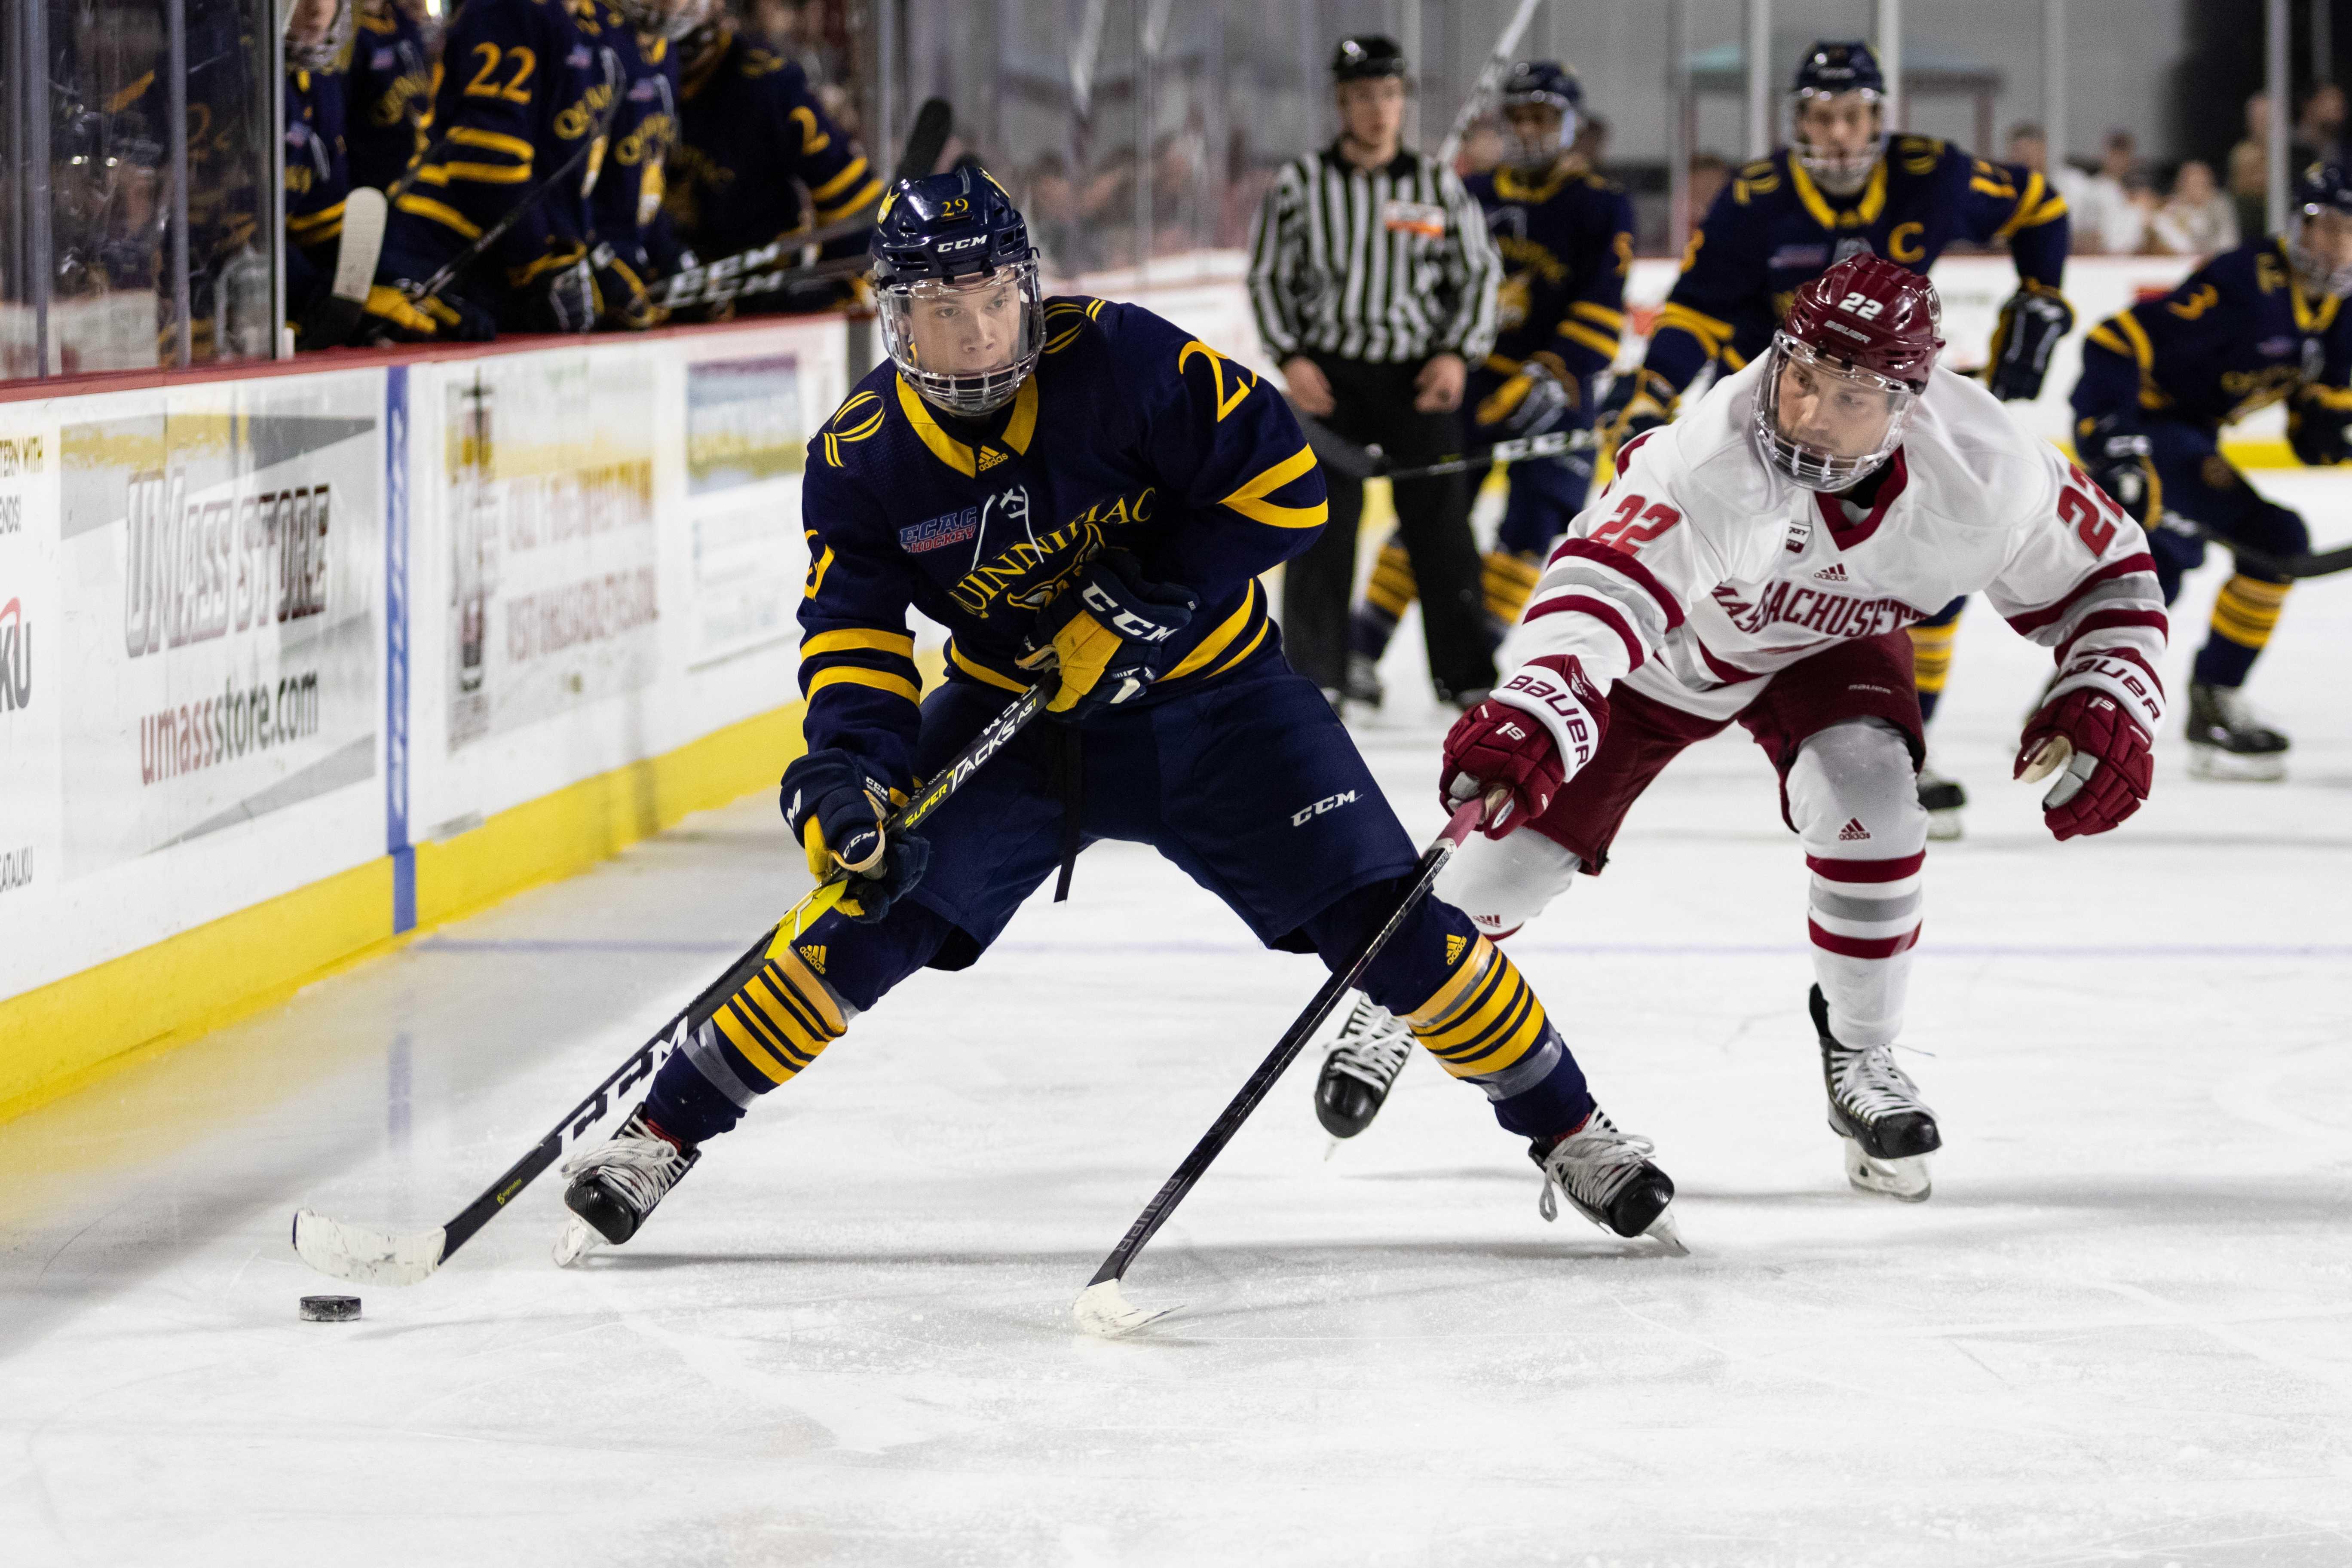 No. 8 Quinnipiac men's ice hockey falls to No. 1 UMass 3-1, head into break with a 14-3-0 record